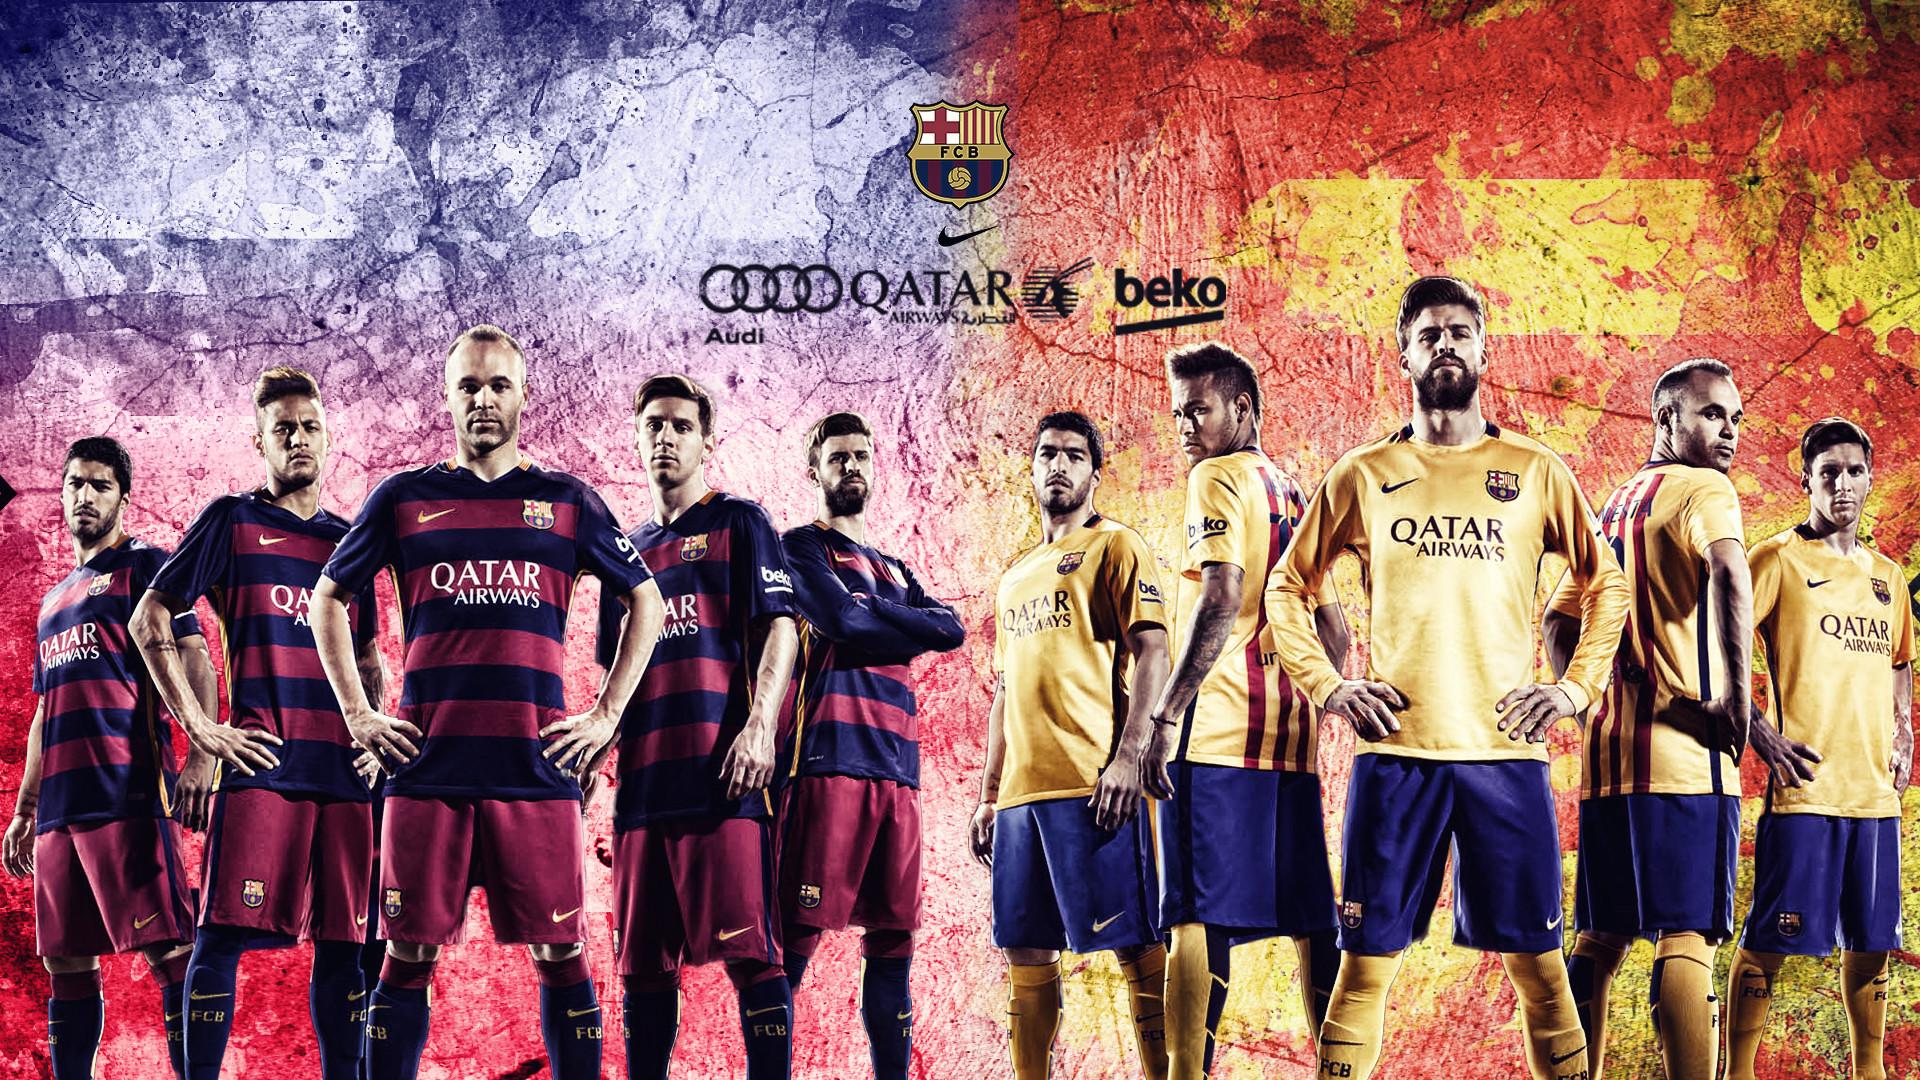 FC Barcelona 2015/2016 Wallpaper by RakaGFX on DeviantArt